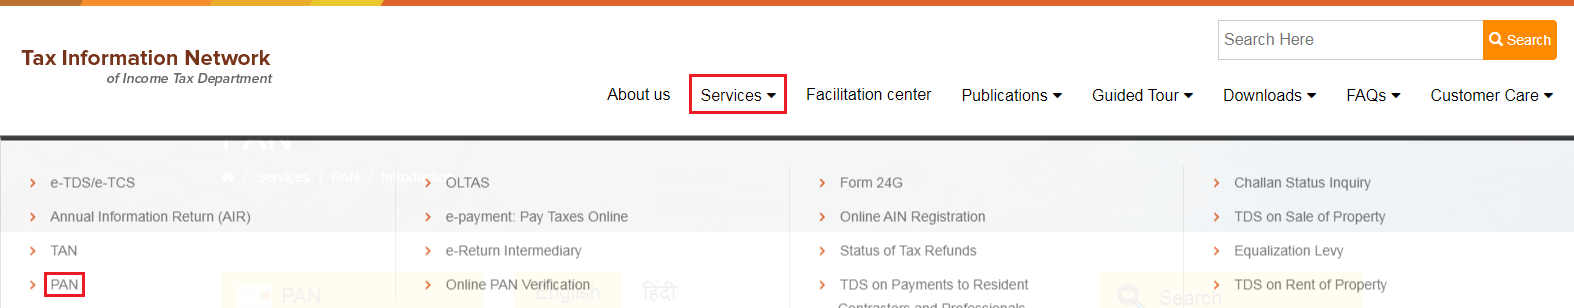 TIN-NSDL - TAN Services